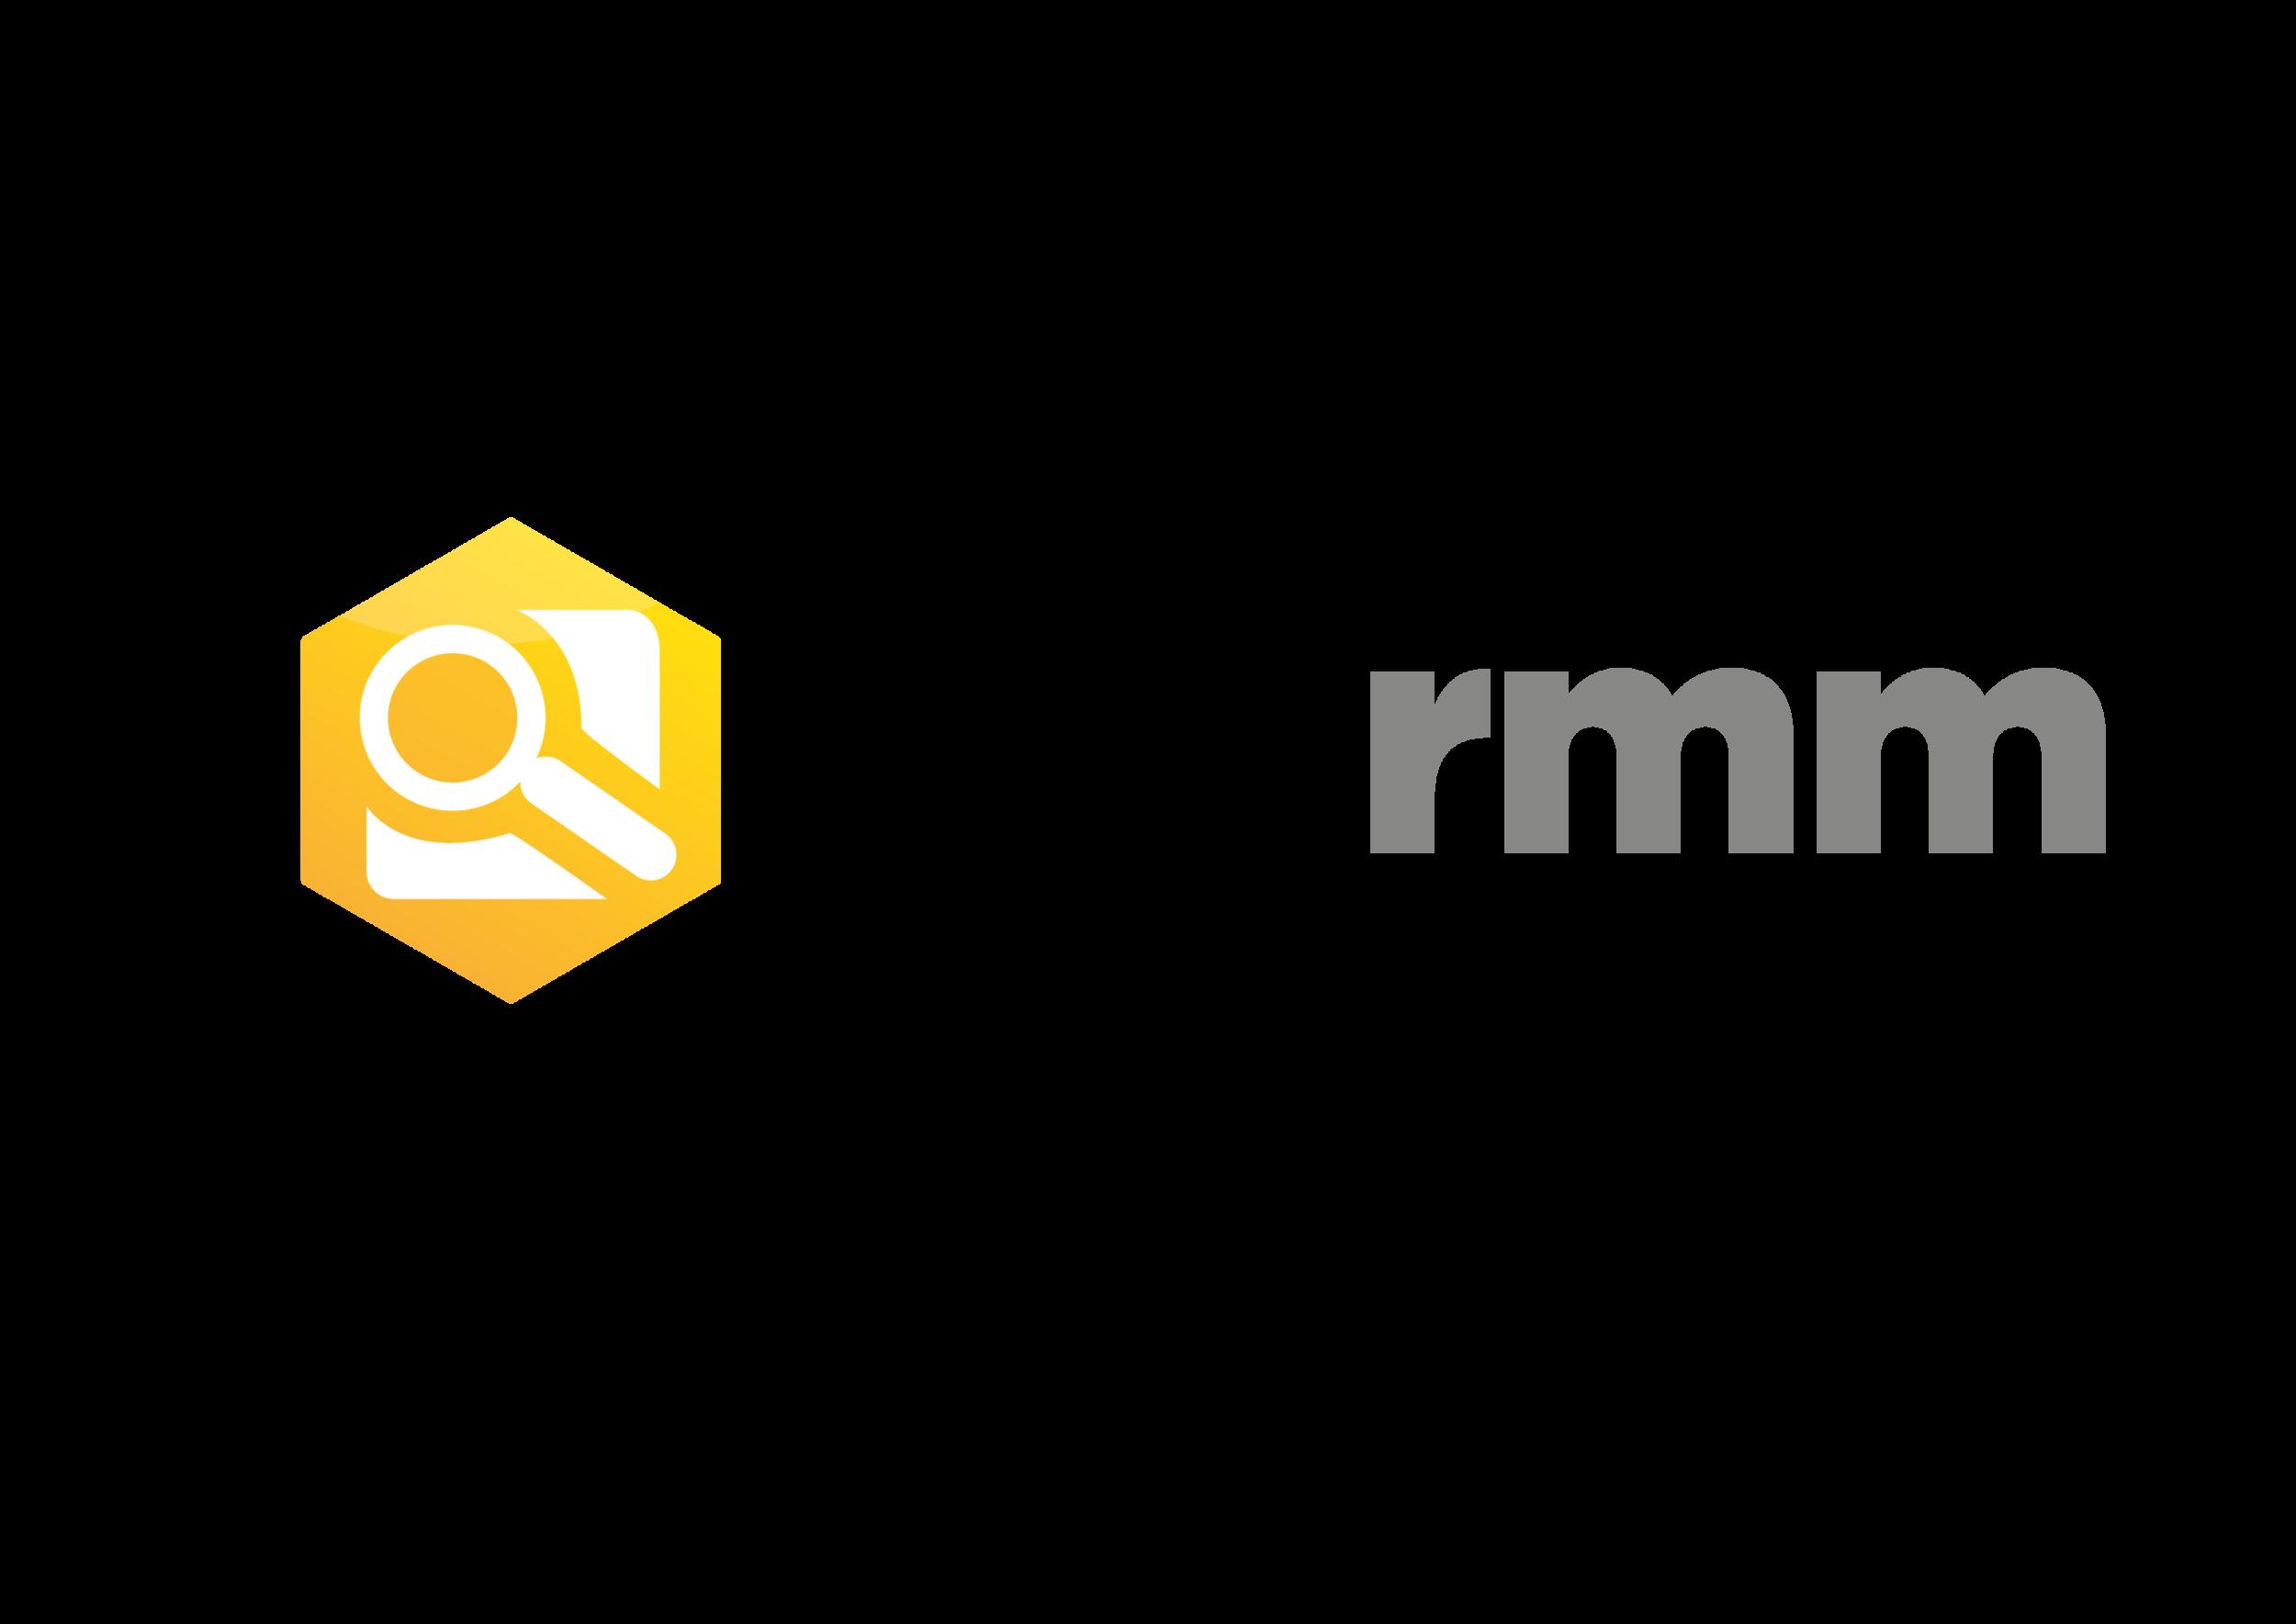 richrmm_logo(trn).png